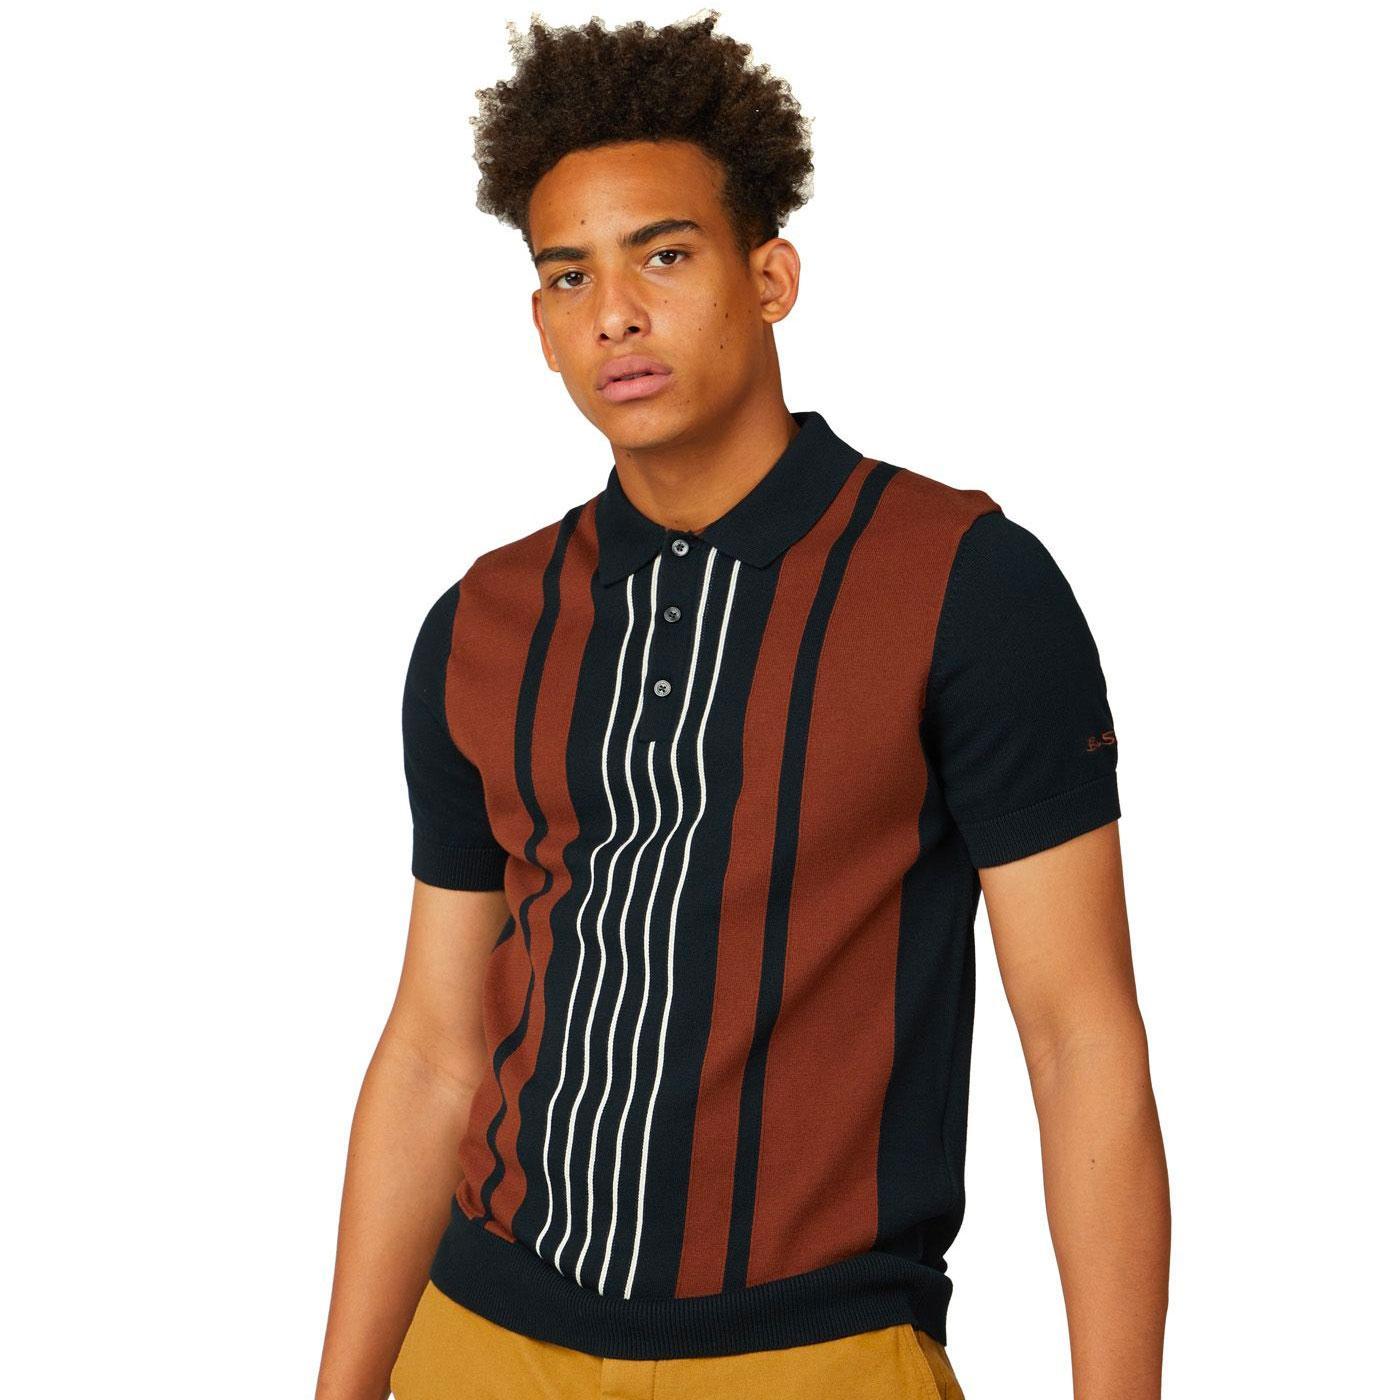 BEN SHERMAN Retro 1960s Knitted Mod Striped Polo B